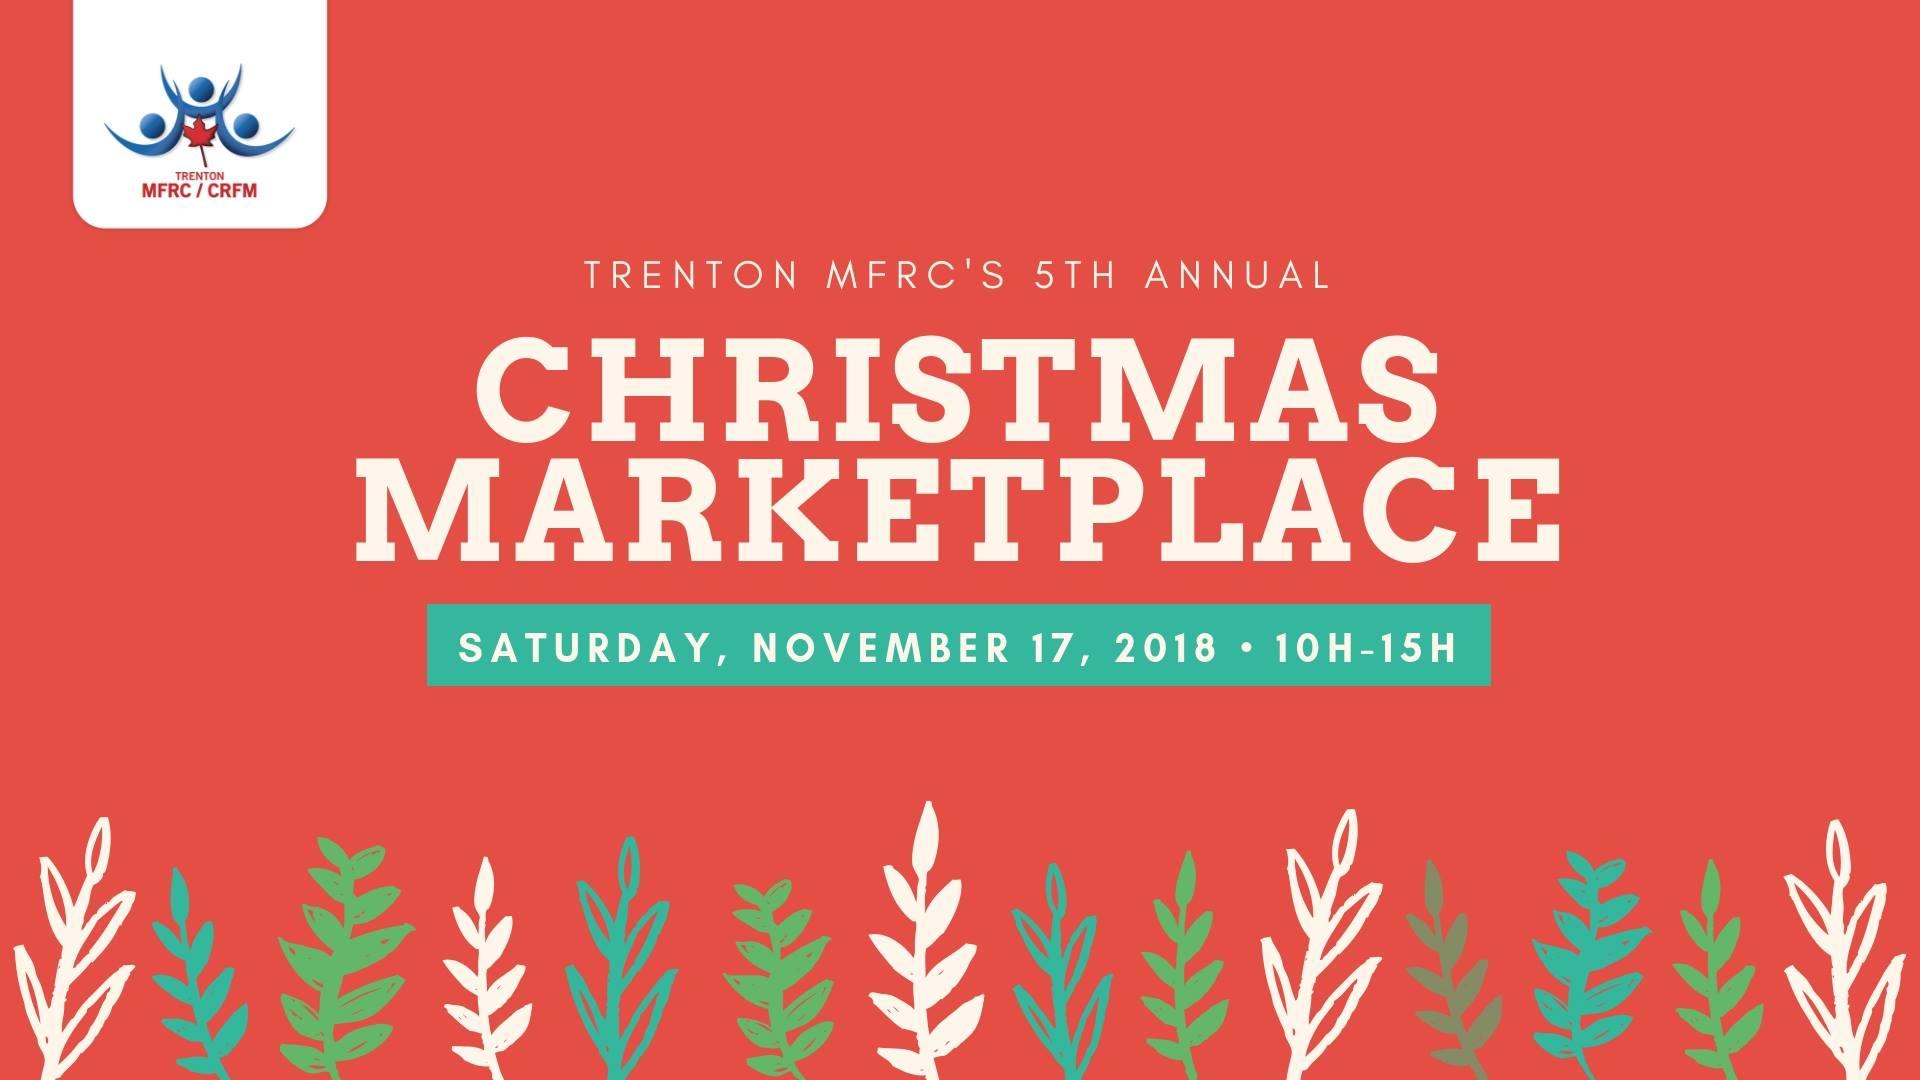 trenton mfrc christmas market